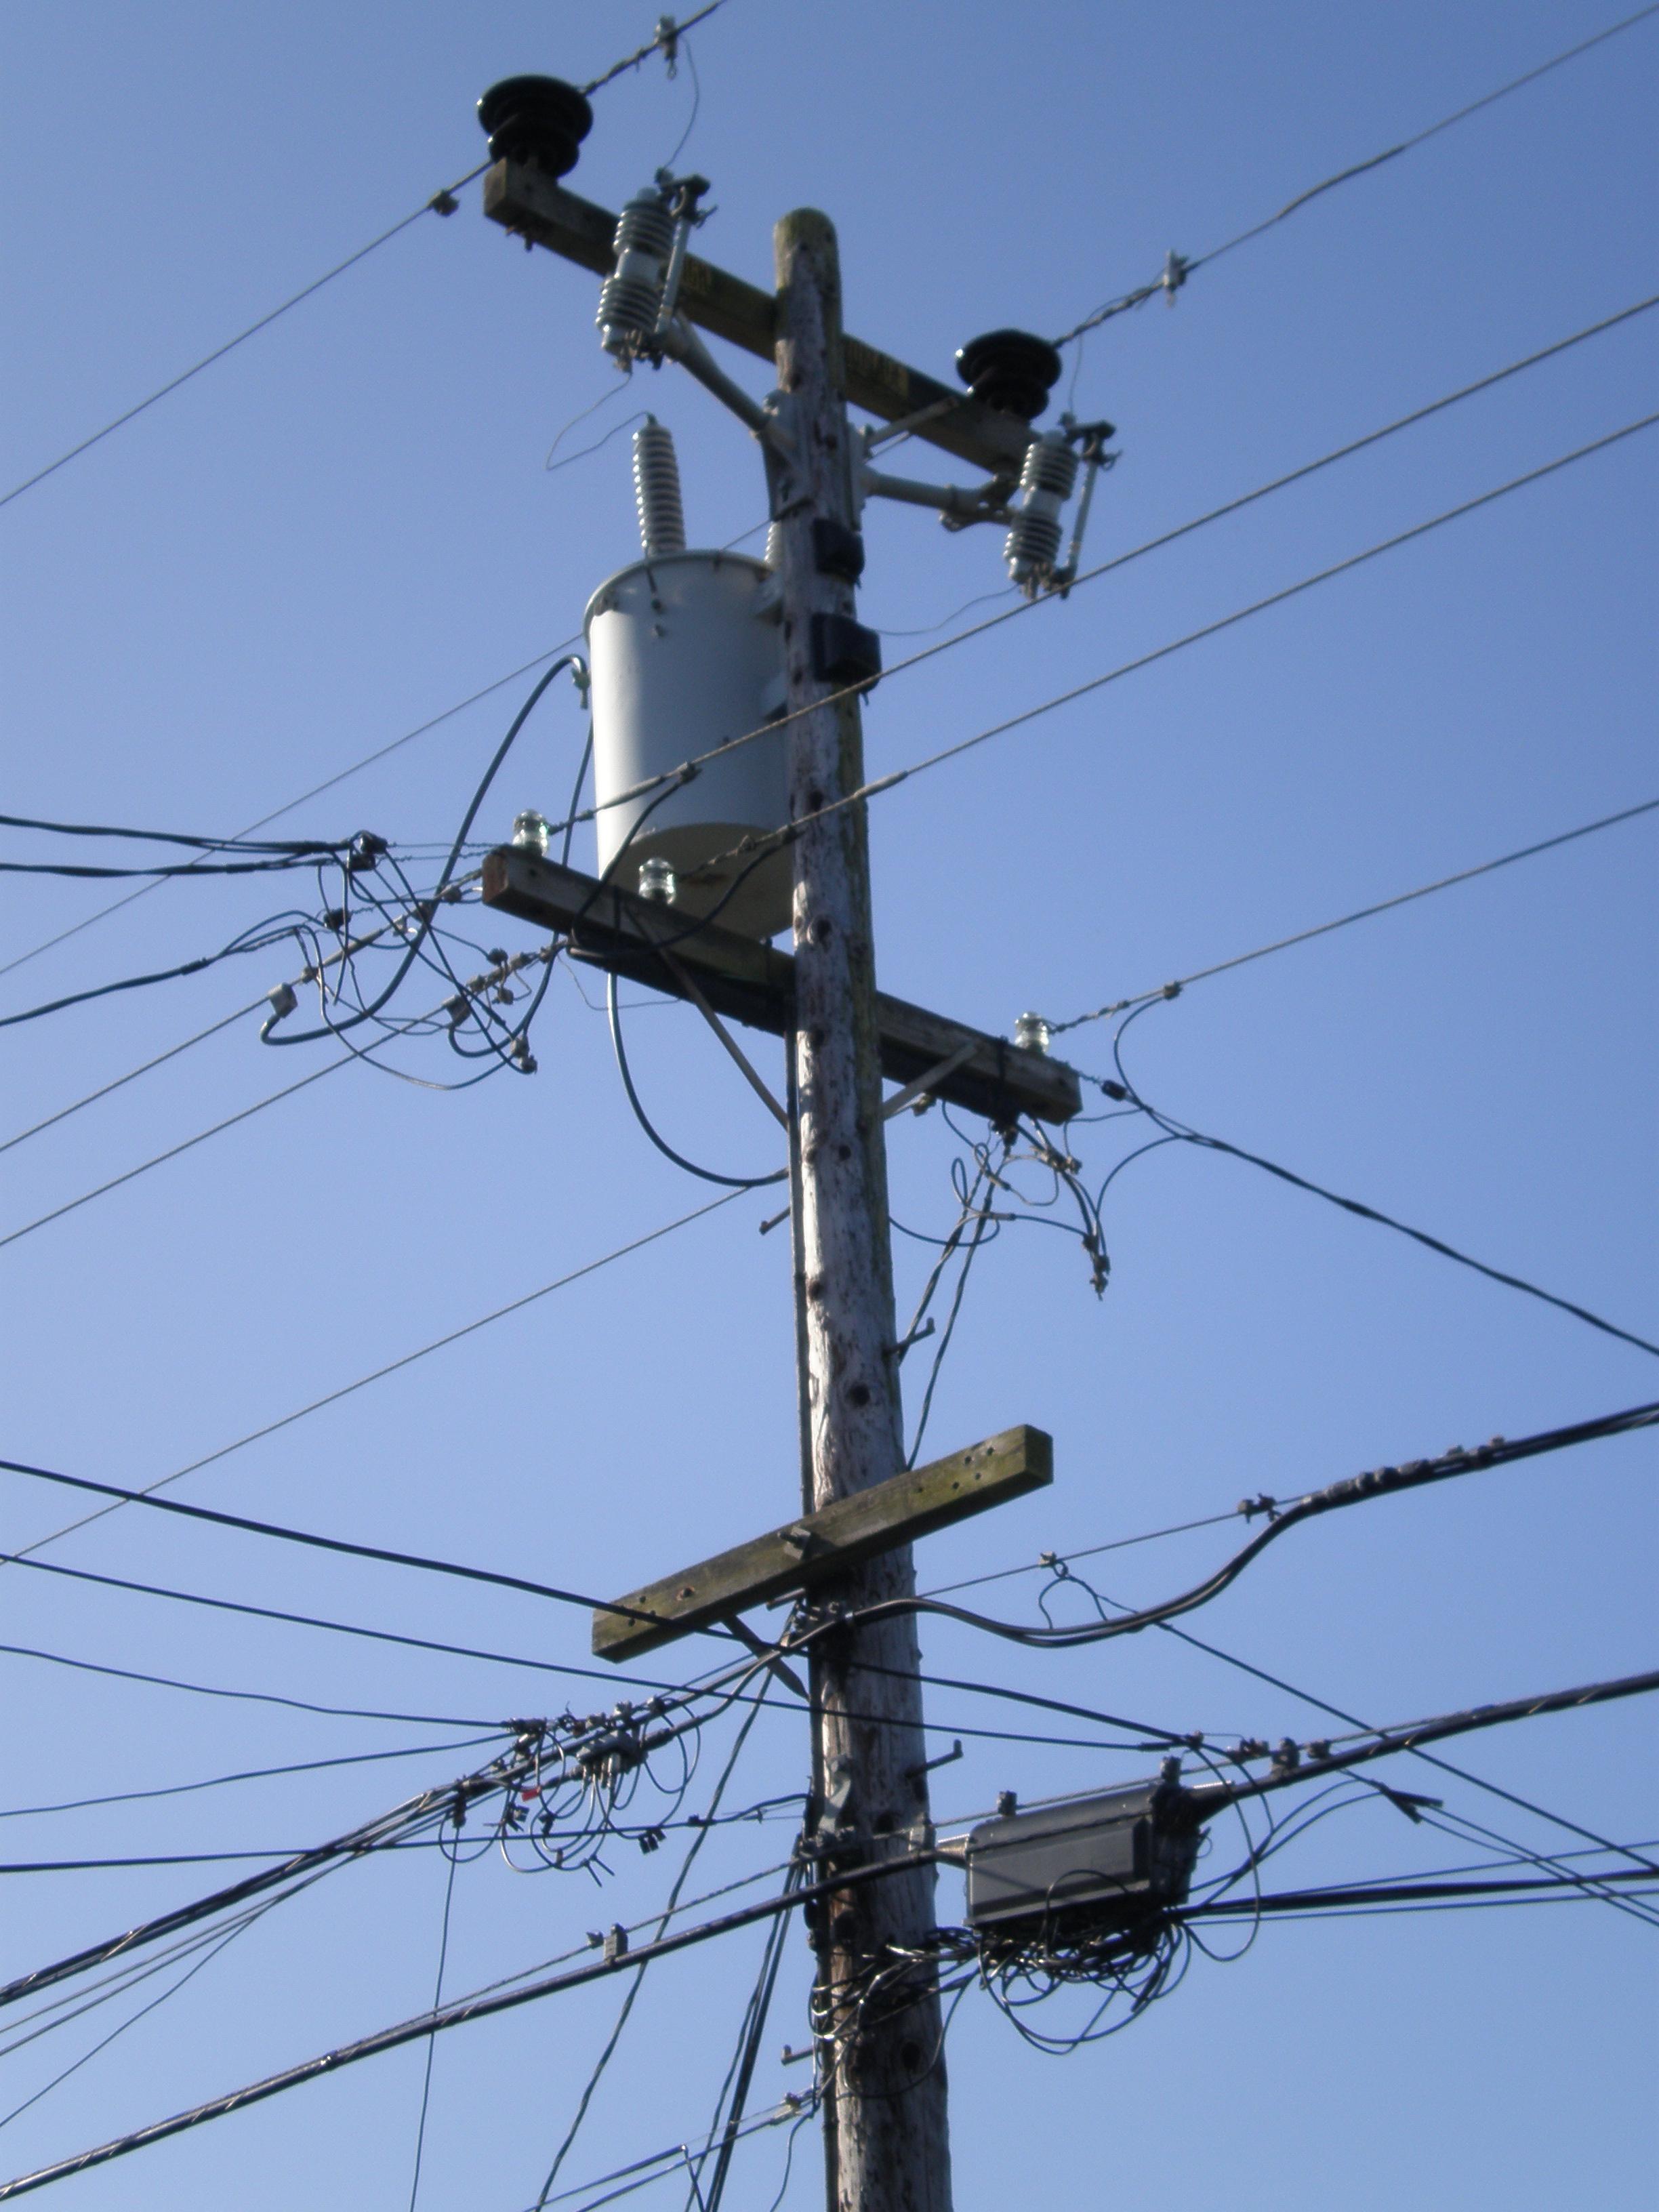 File:SSF utility pole 1 front.JPG - Wikimedia Commons